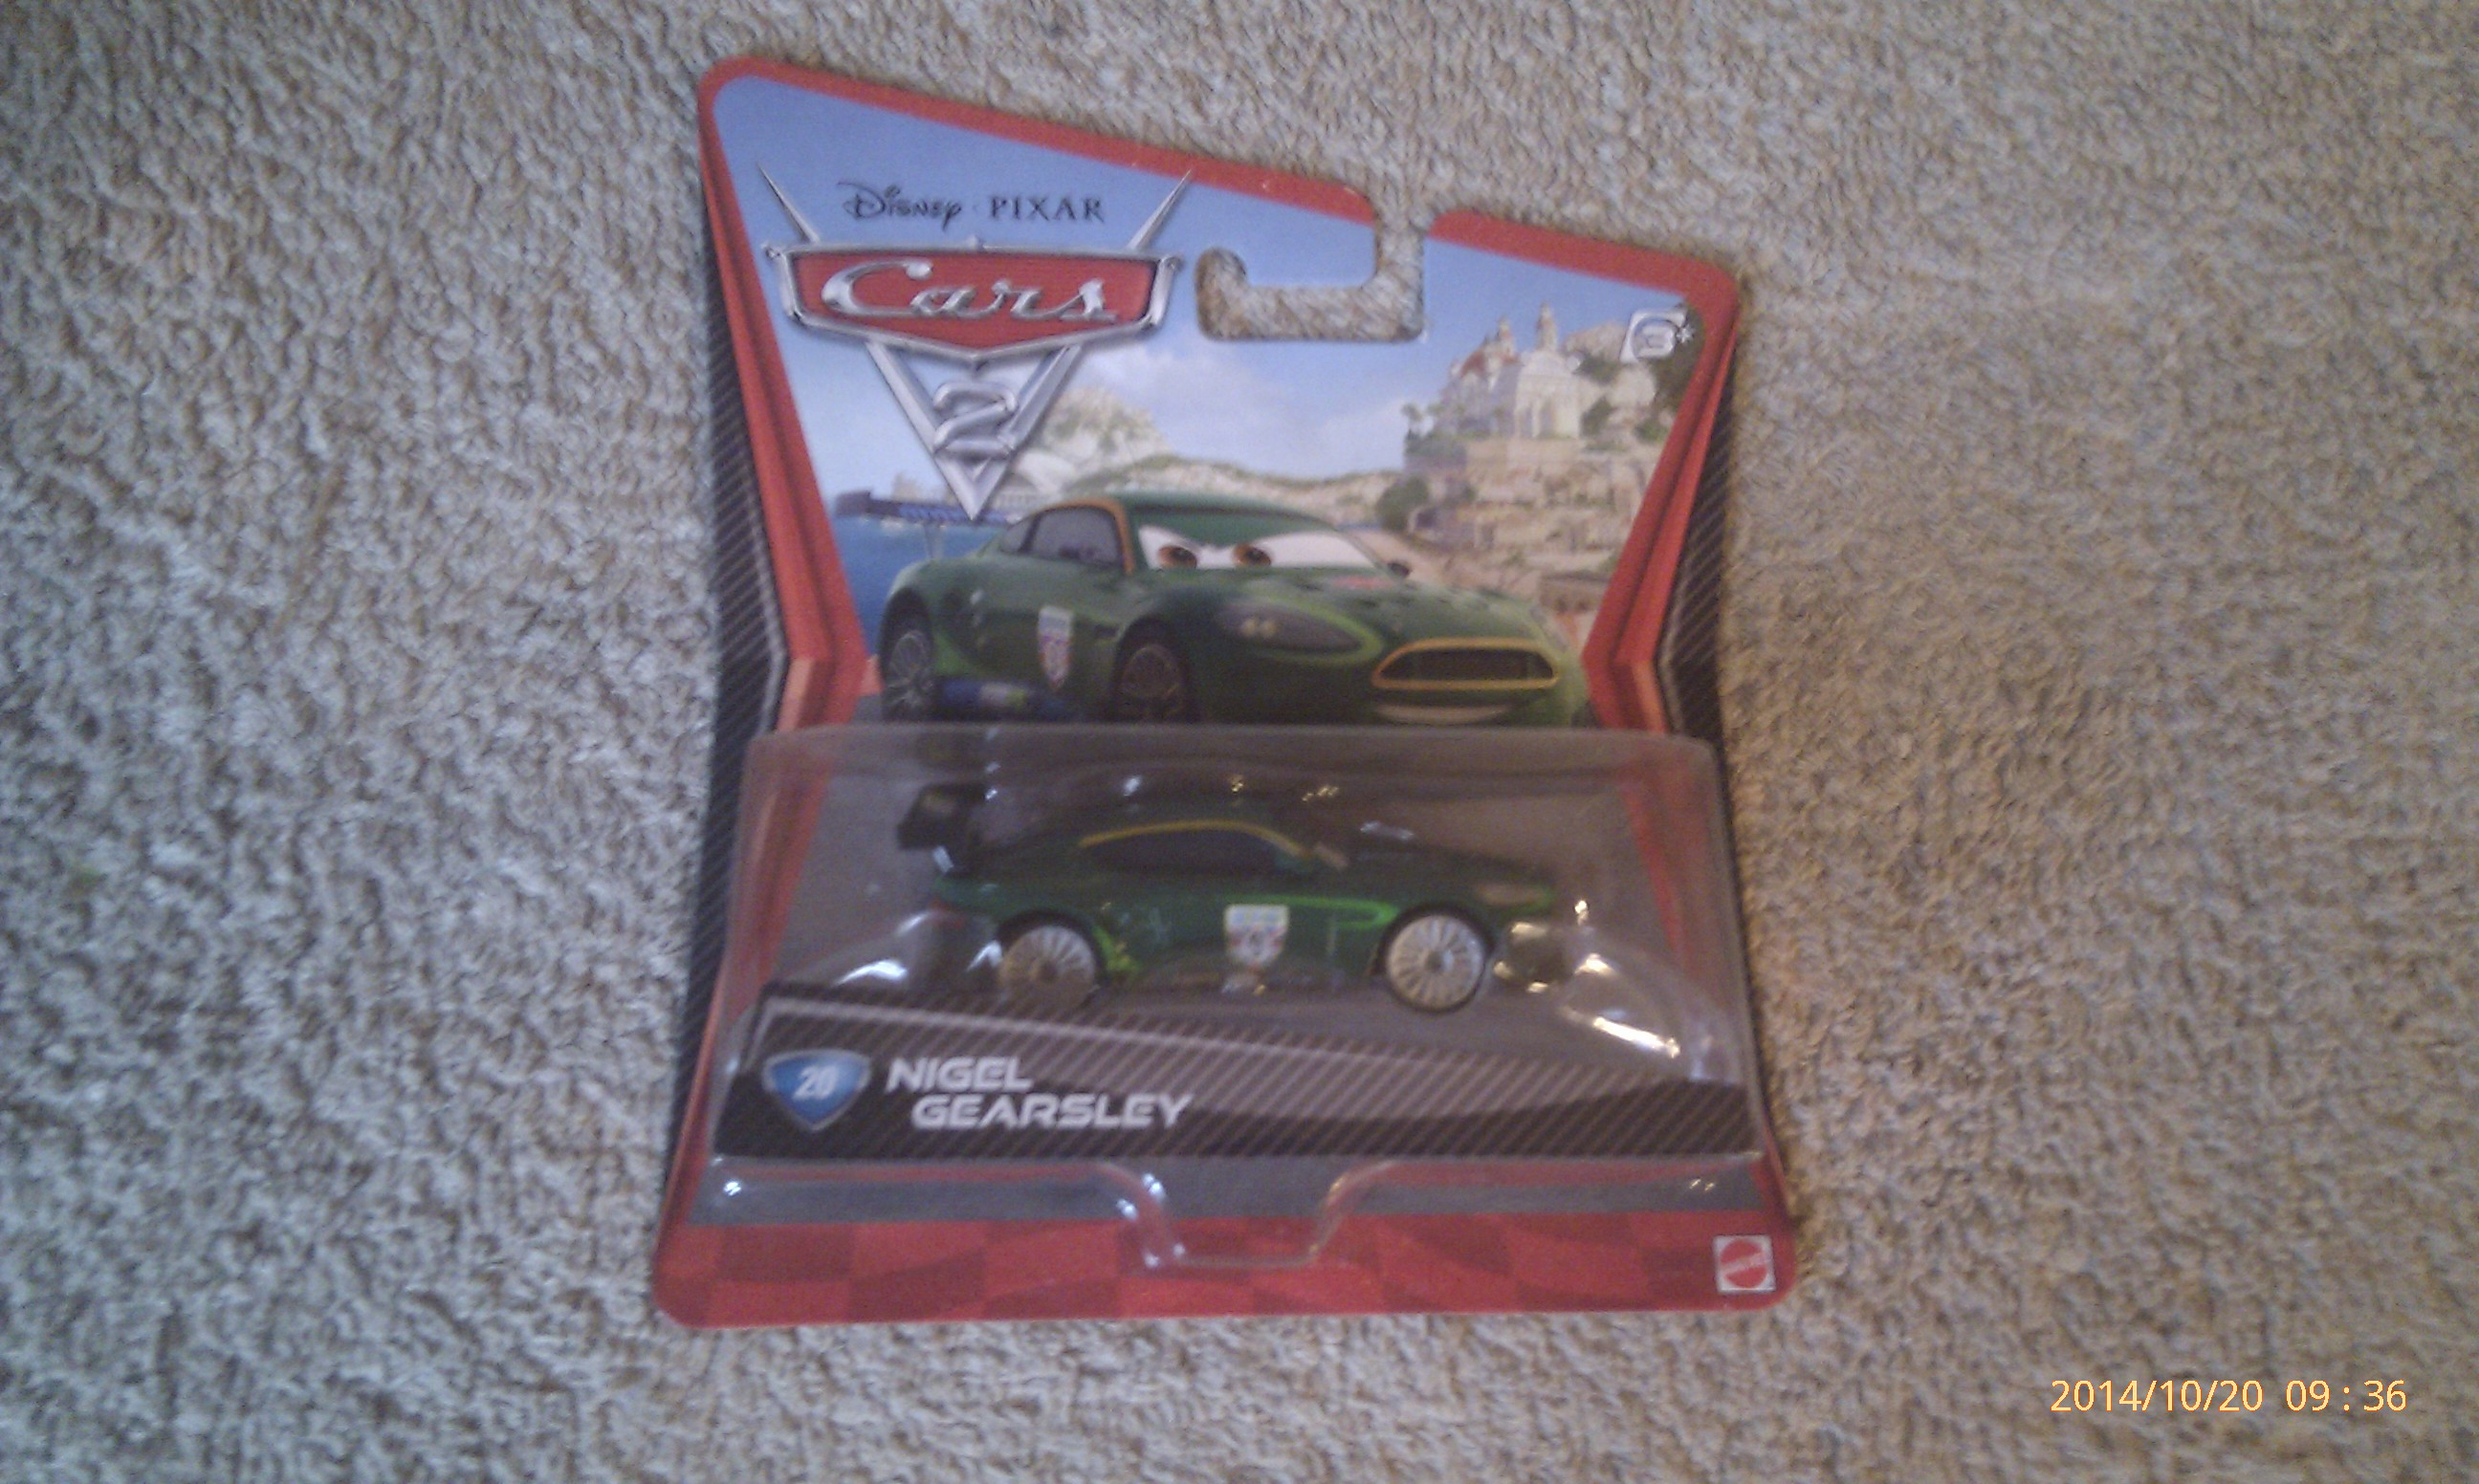 Cars 2 - Nigel Gearsley 20